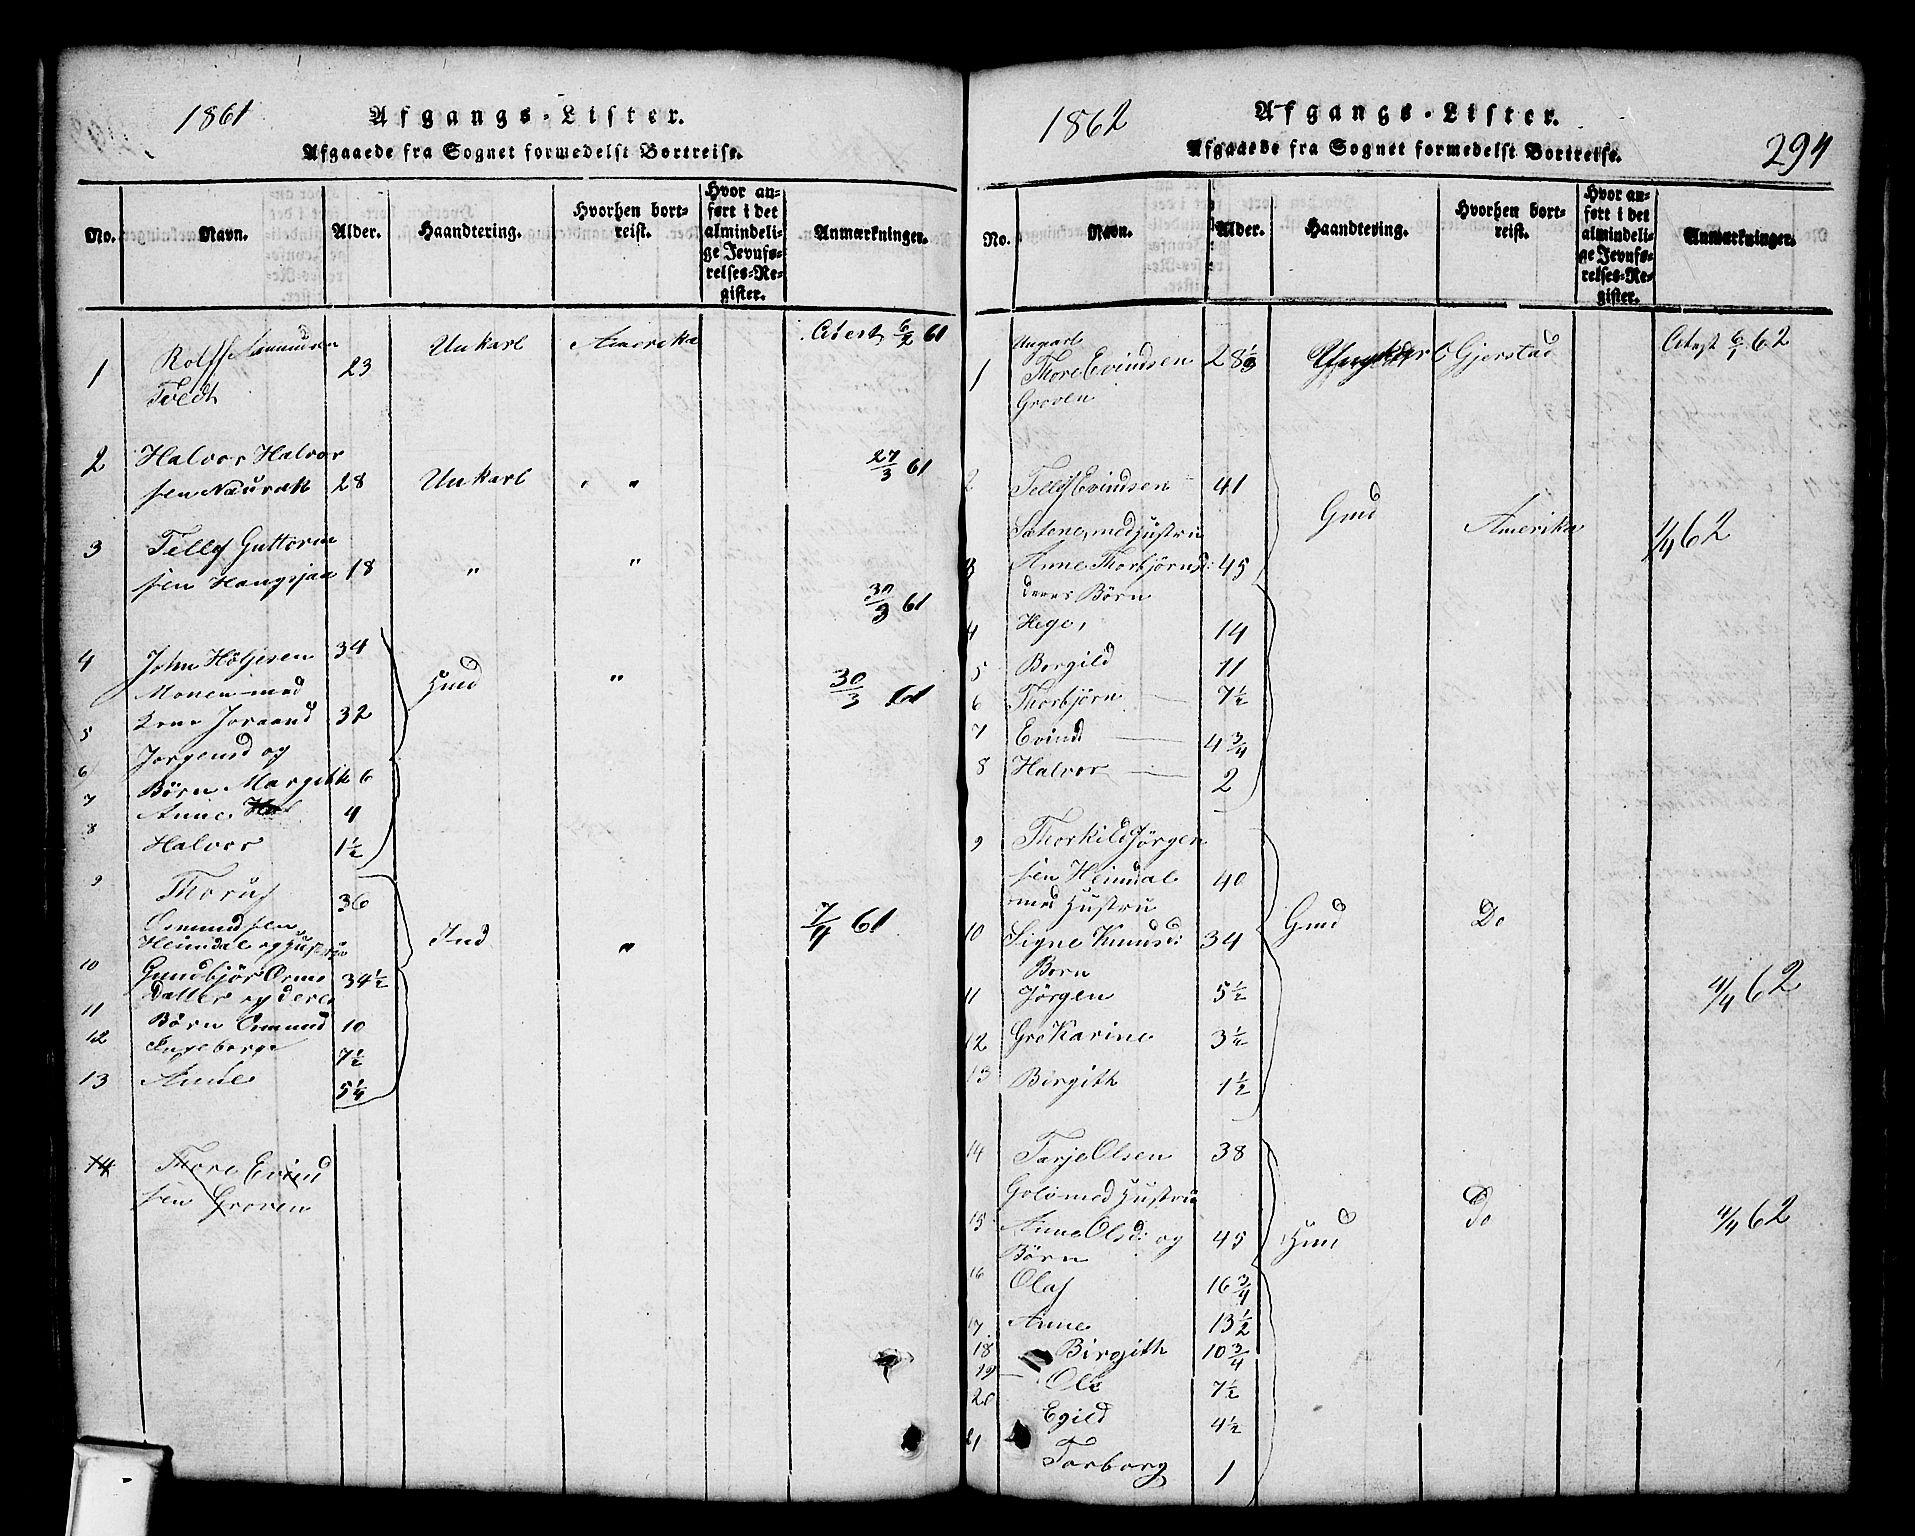 SAKO, Nissedal kirkebøker, G/Gb/L0001: Klokkerbok nr. II 1, 1814-1862, s. 294